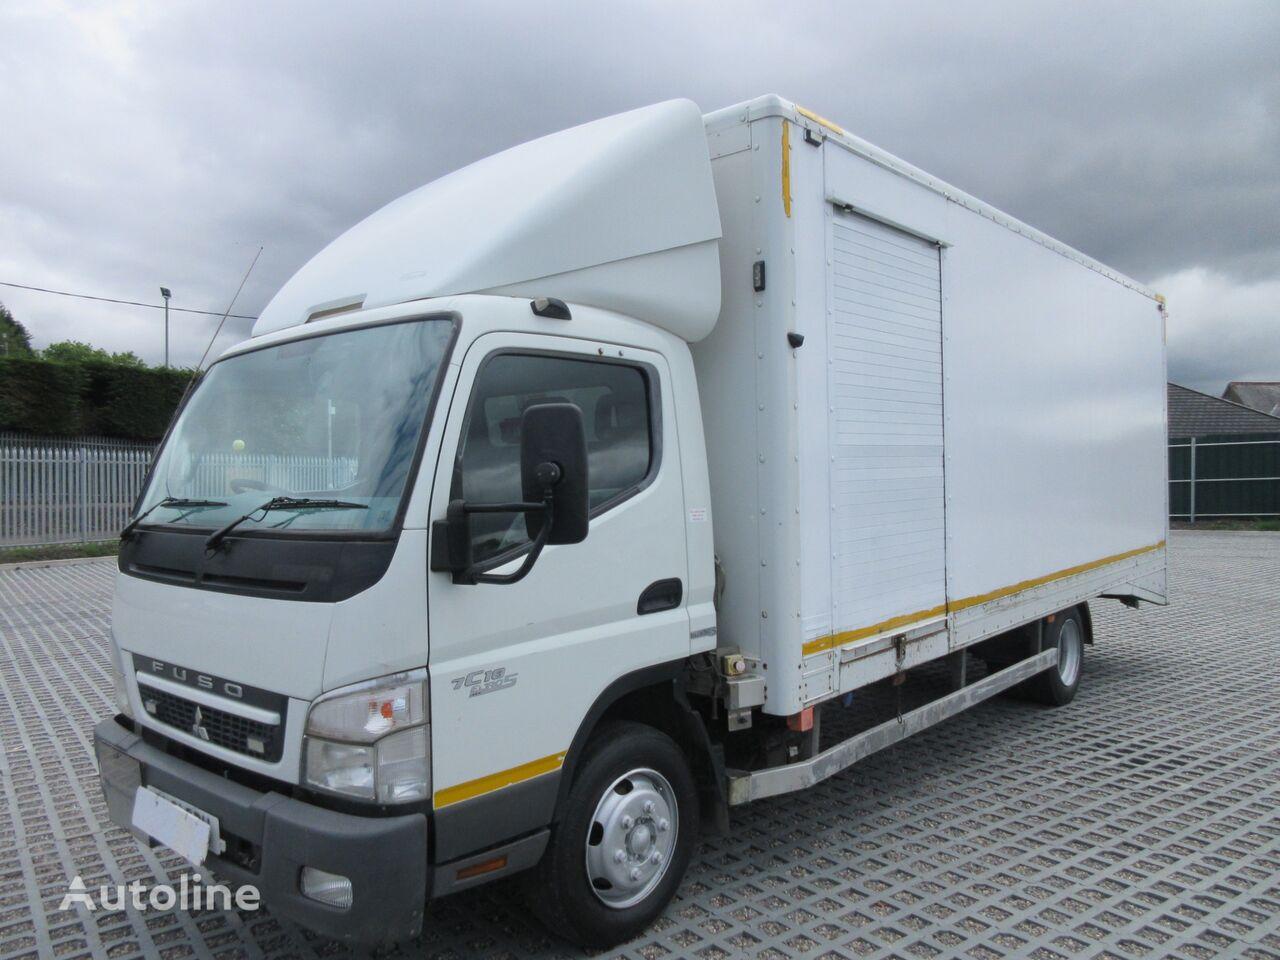 MITSUBISHI CANTER 7C18 FUSO 4X2 7.5TON BEAVERTAIL BOX VAN C/W ROLLER SHUTTE kamion furgon